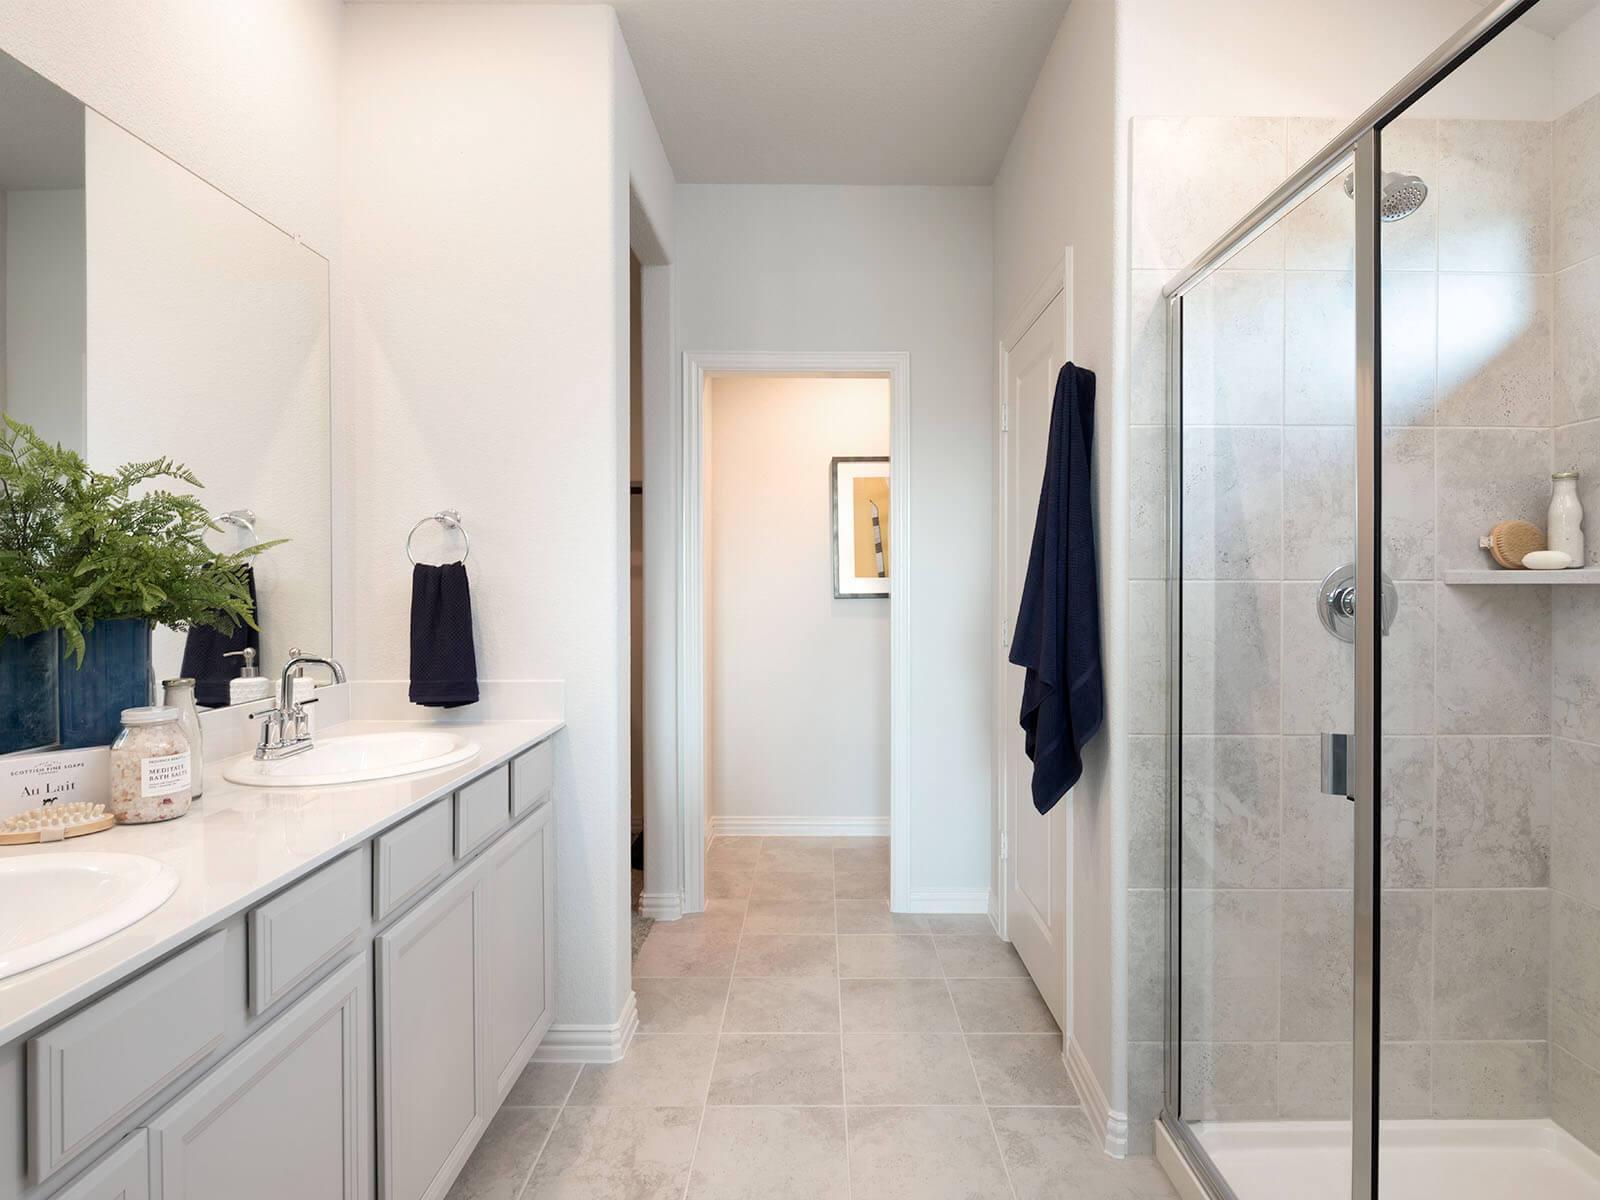 Bathroom featured in The Preston By Meritage Homes in Dallas, TX